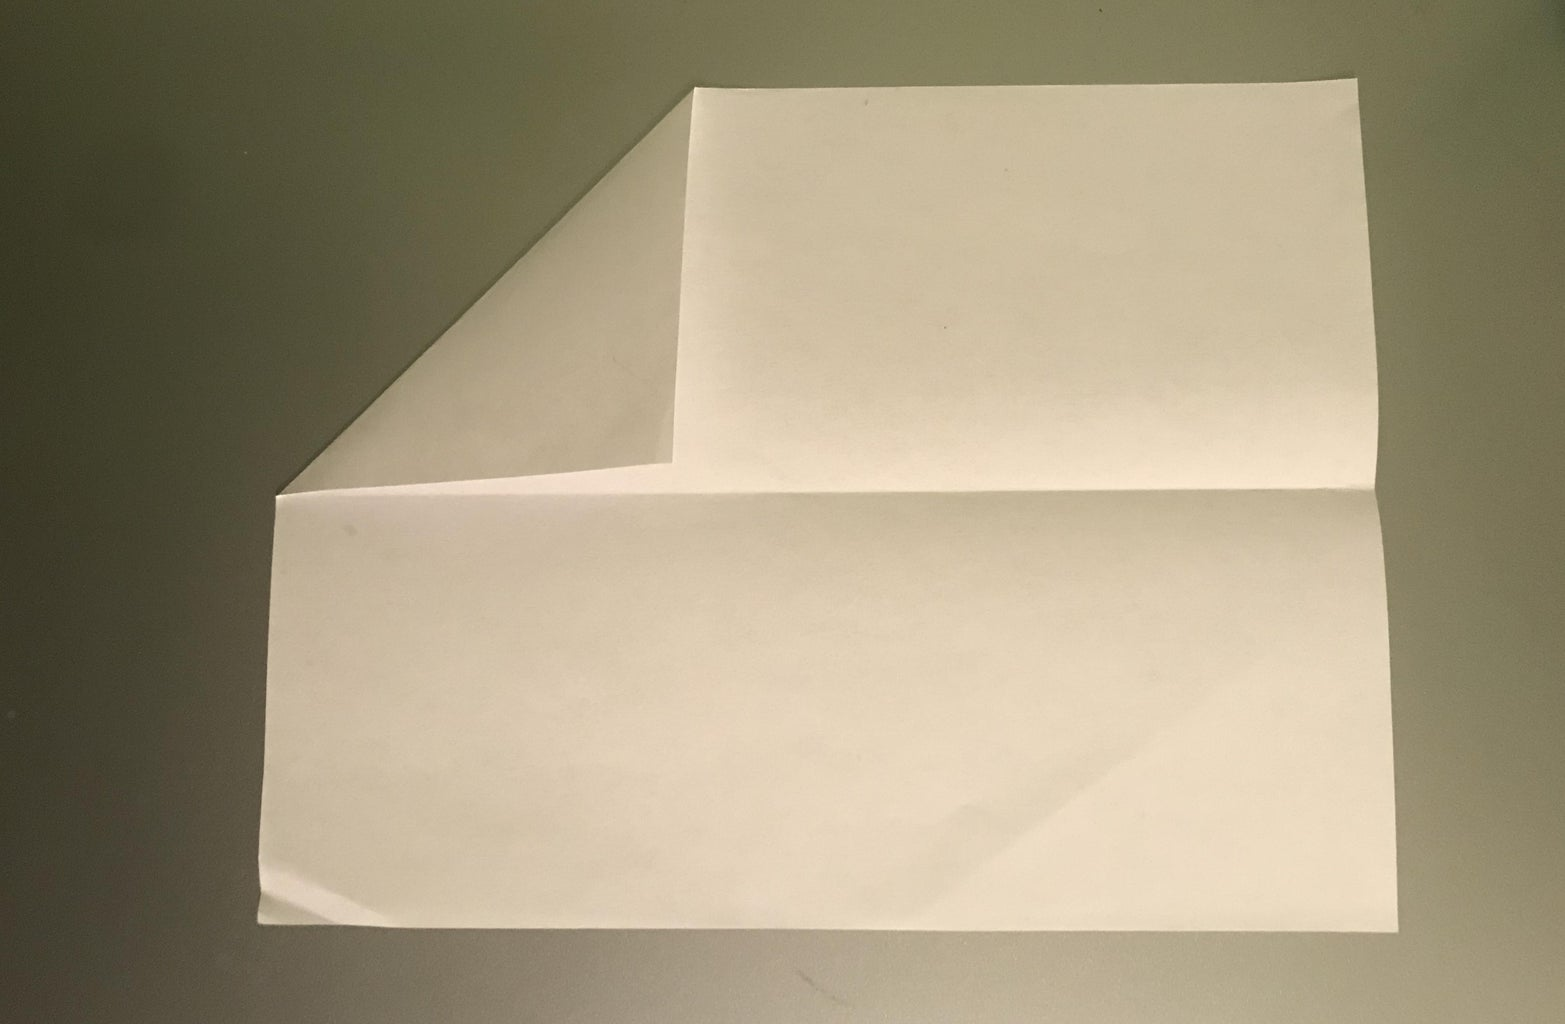 Fold the First Corner